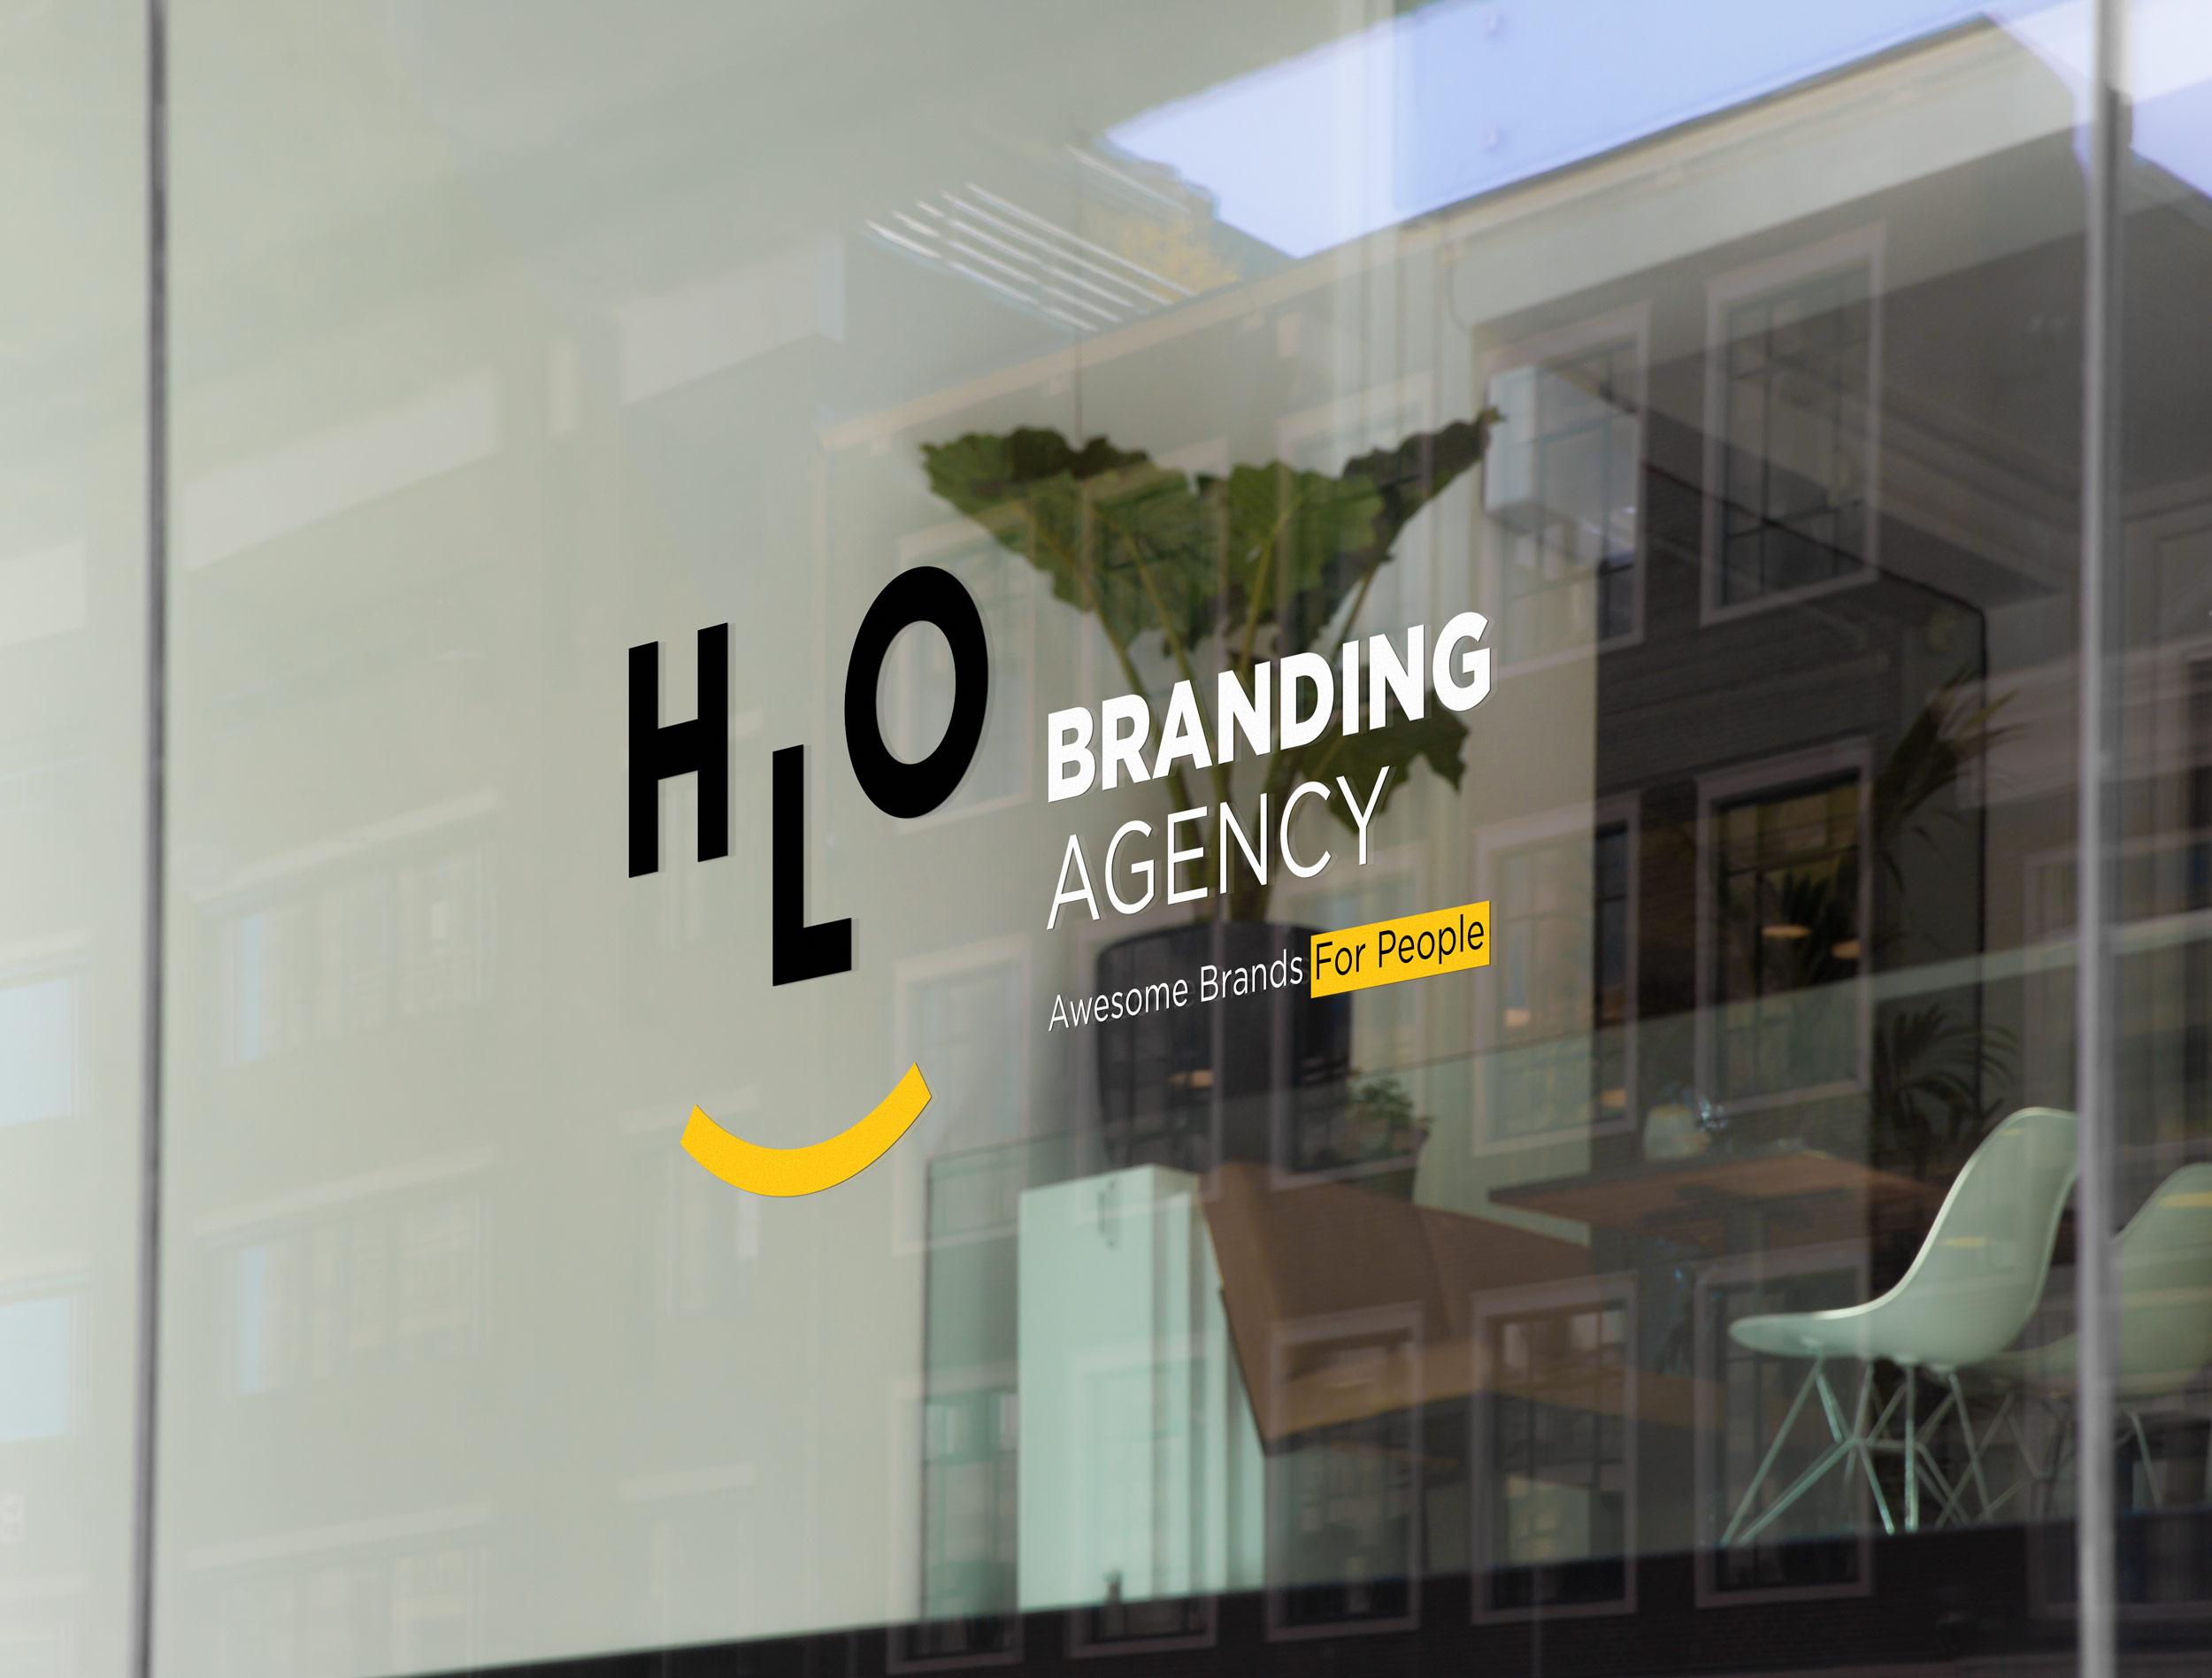 Rebranding a branding agency